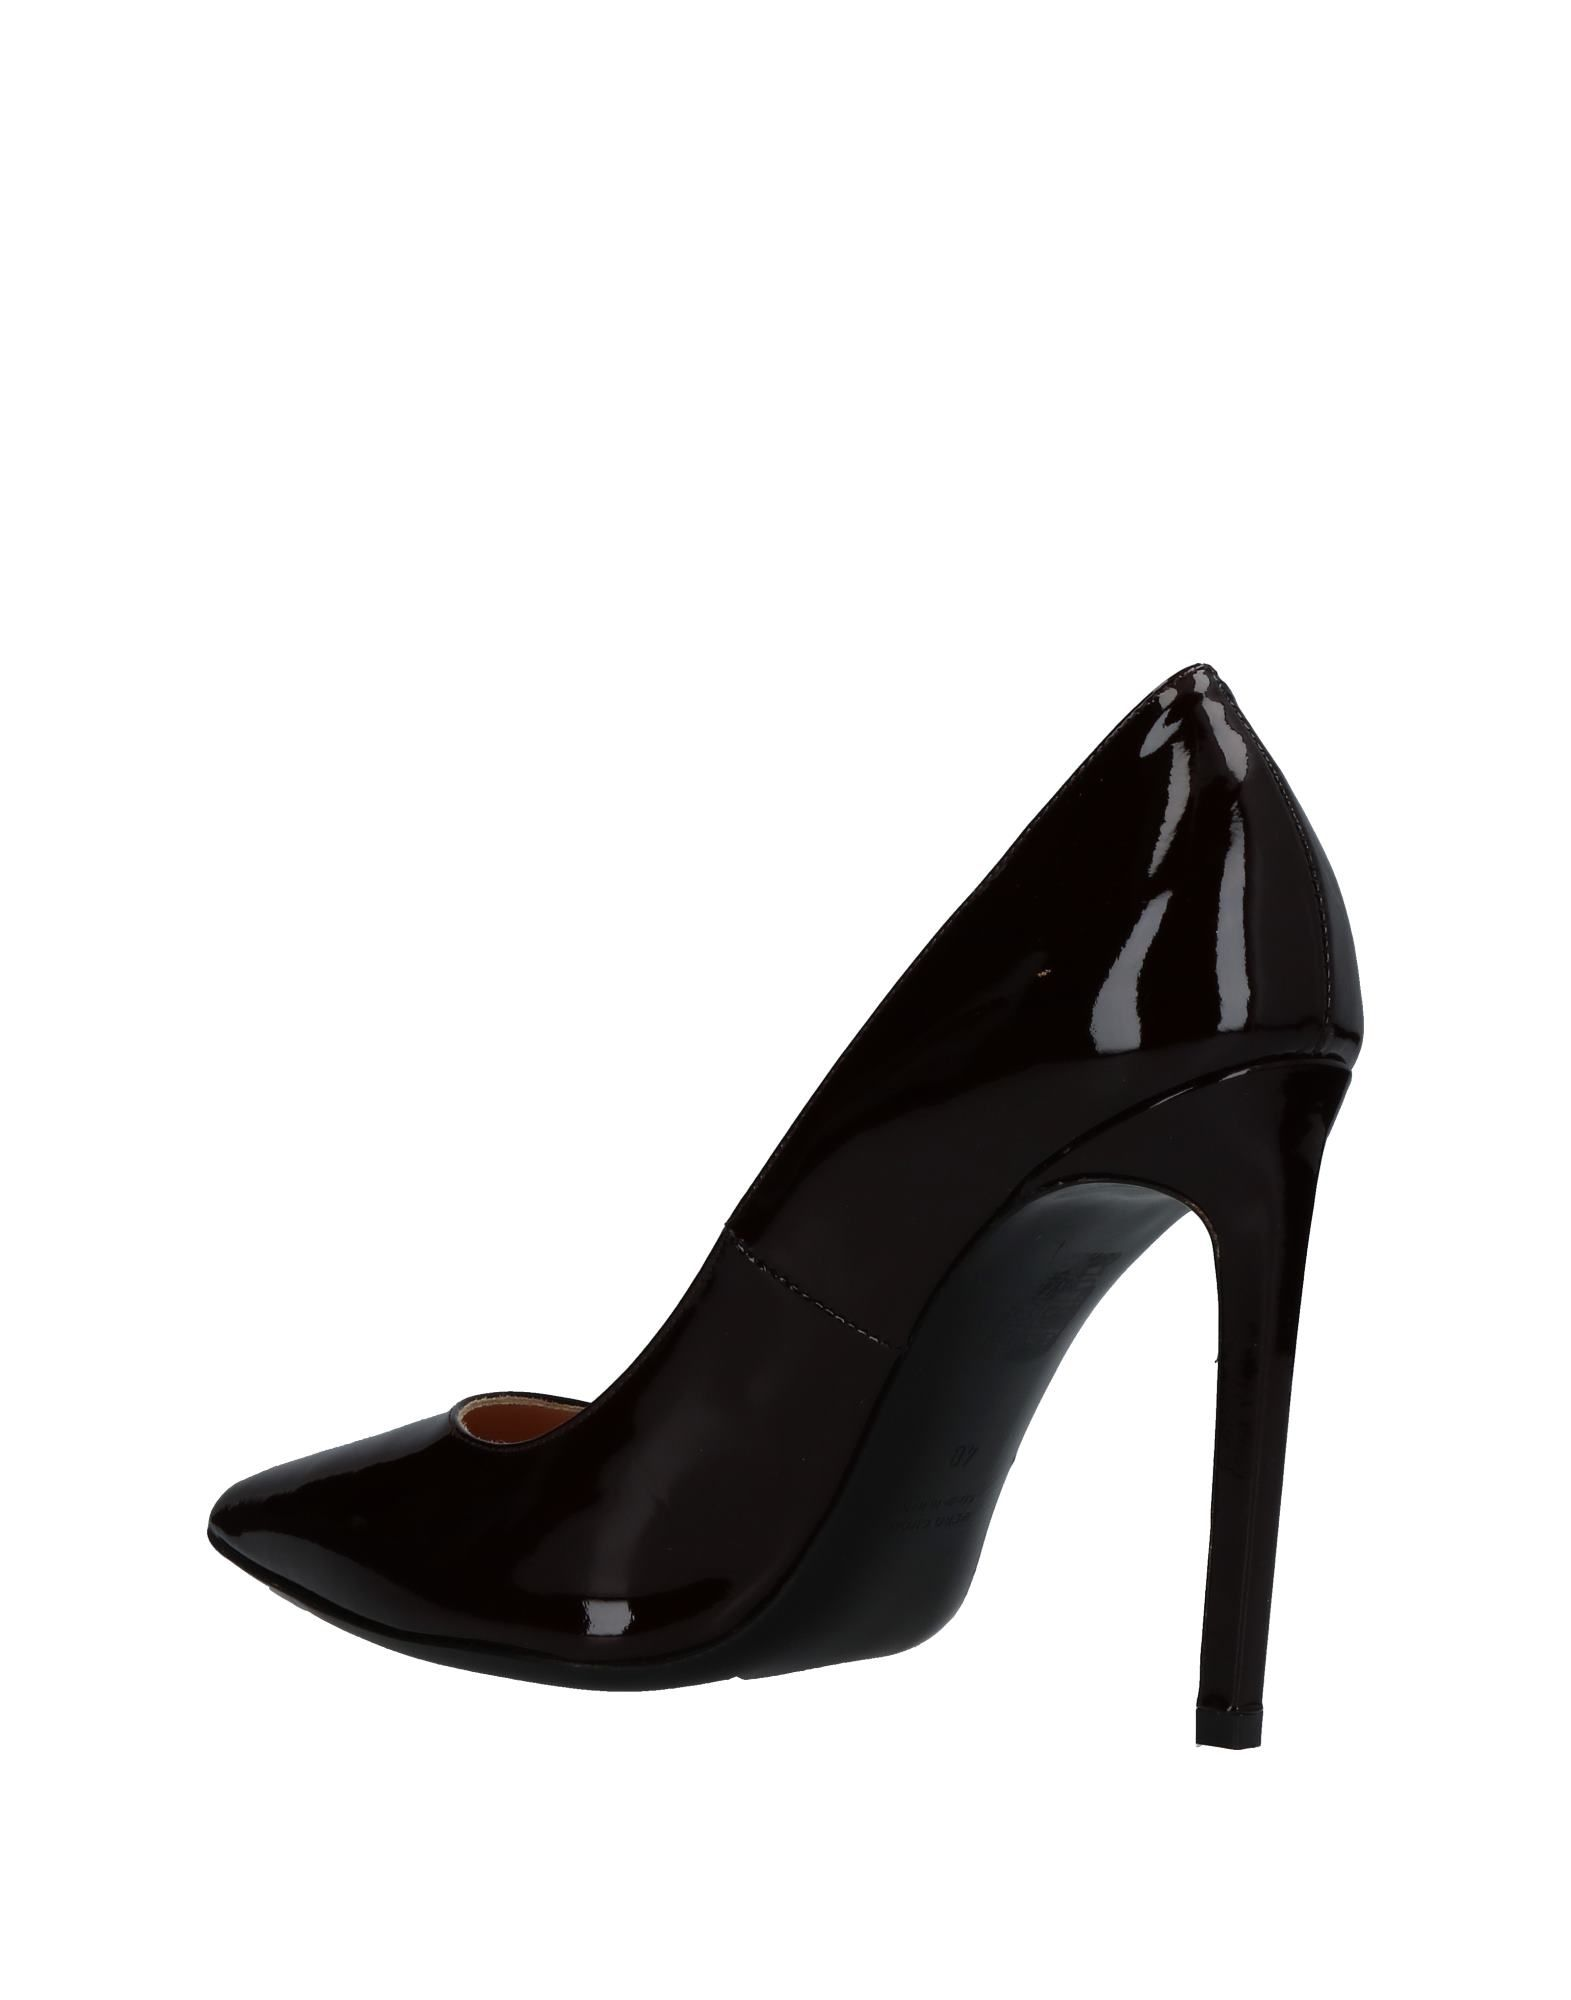 Gut Barbabella um billige Schuhe zu tragenMarco Barbabella Gut Pumps Damen  11341651RR 5e7840